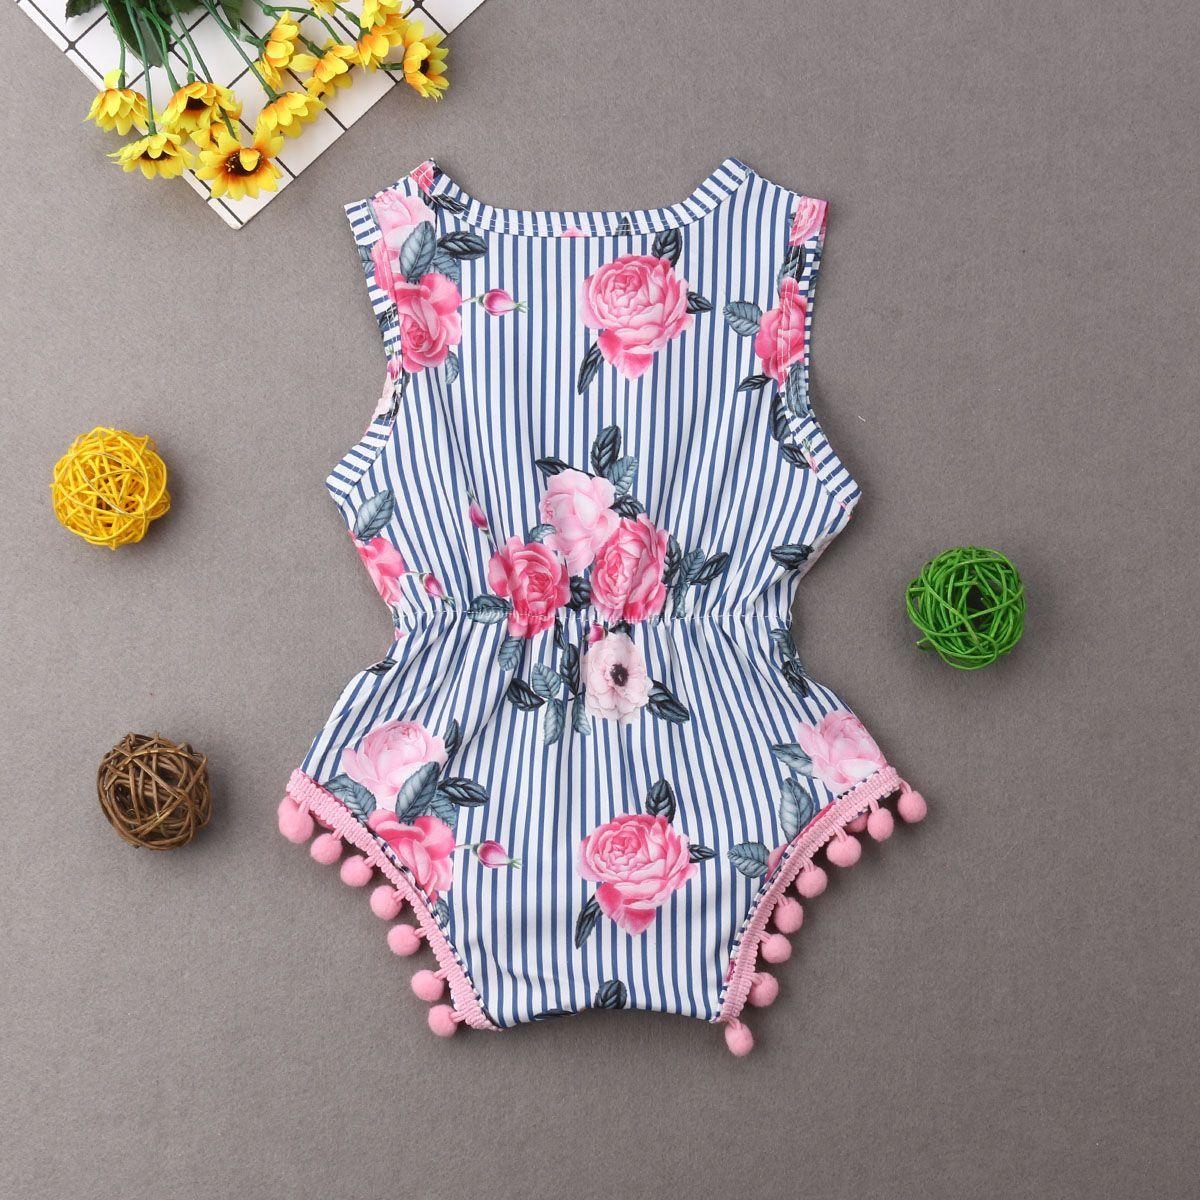 Verão Infante recém-nascido Bebés Meninas Bodysuits florais Jumpsuit Moda Tassel mangas Criança Bebê sunsuit Roupa Beachwear